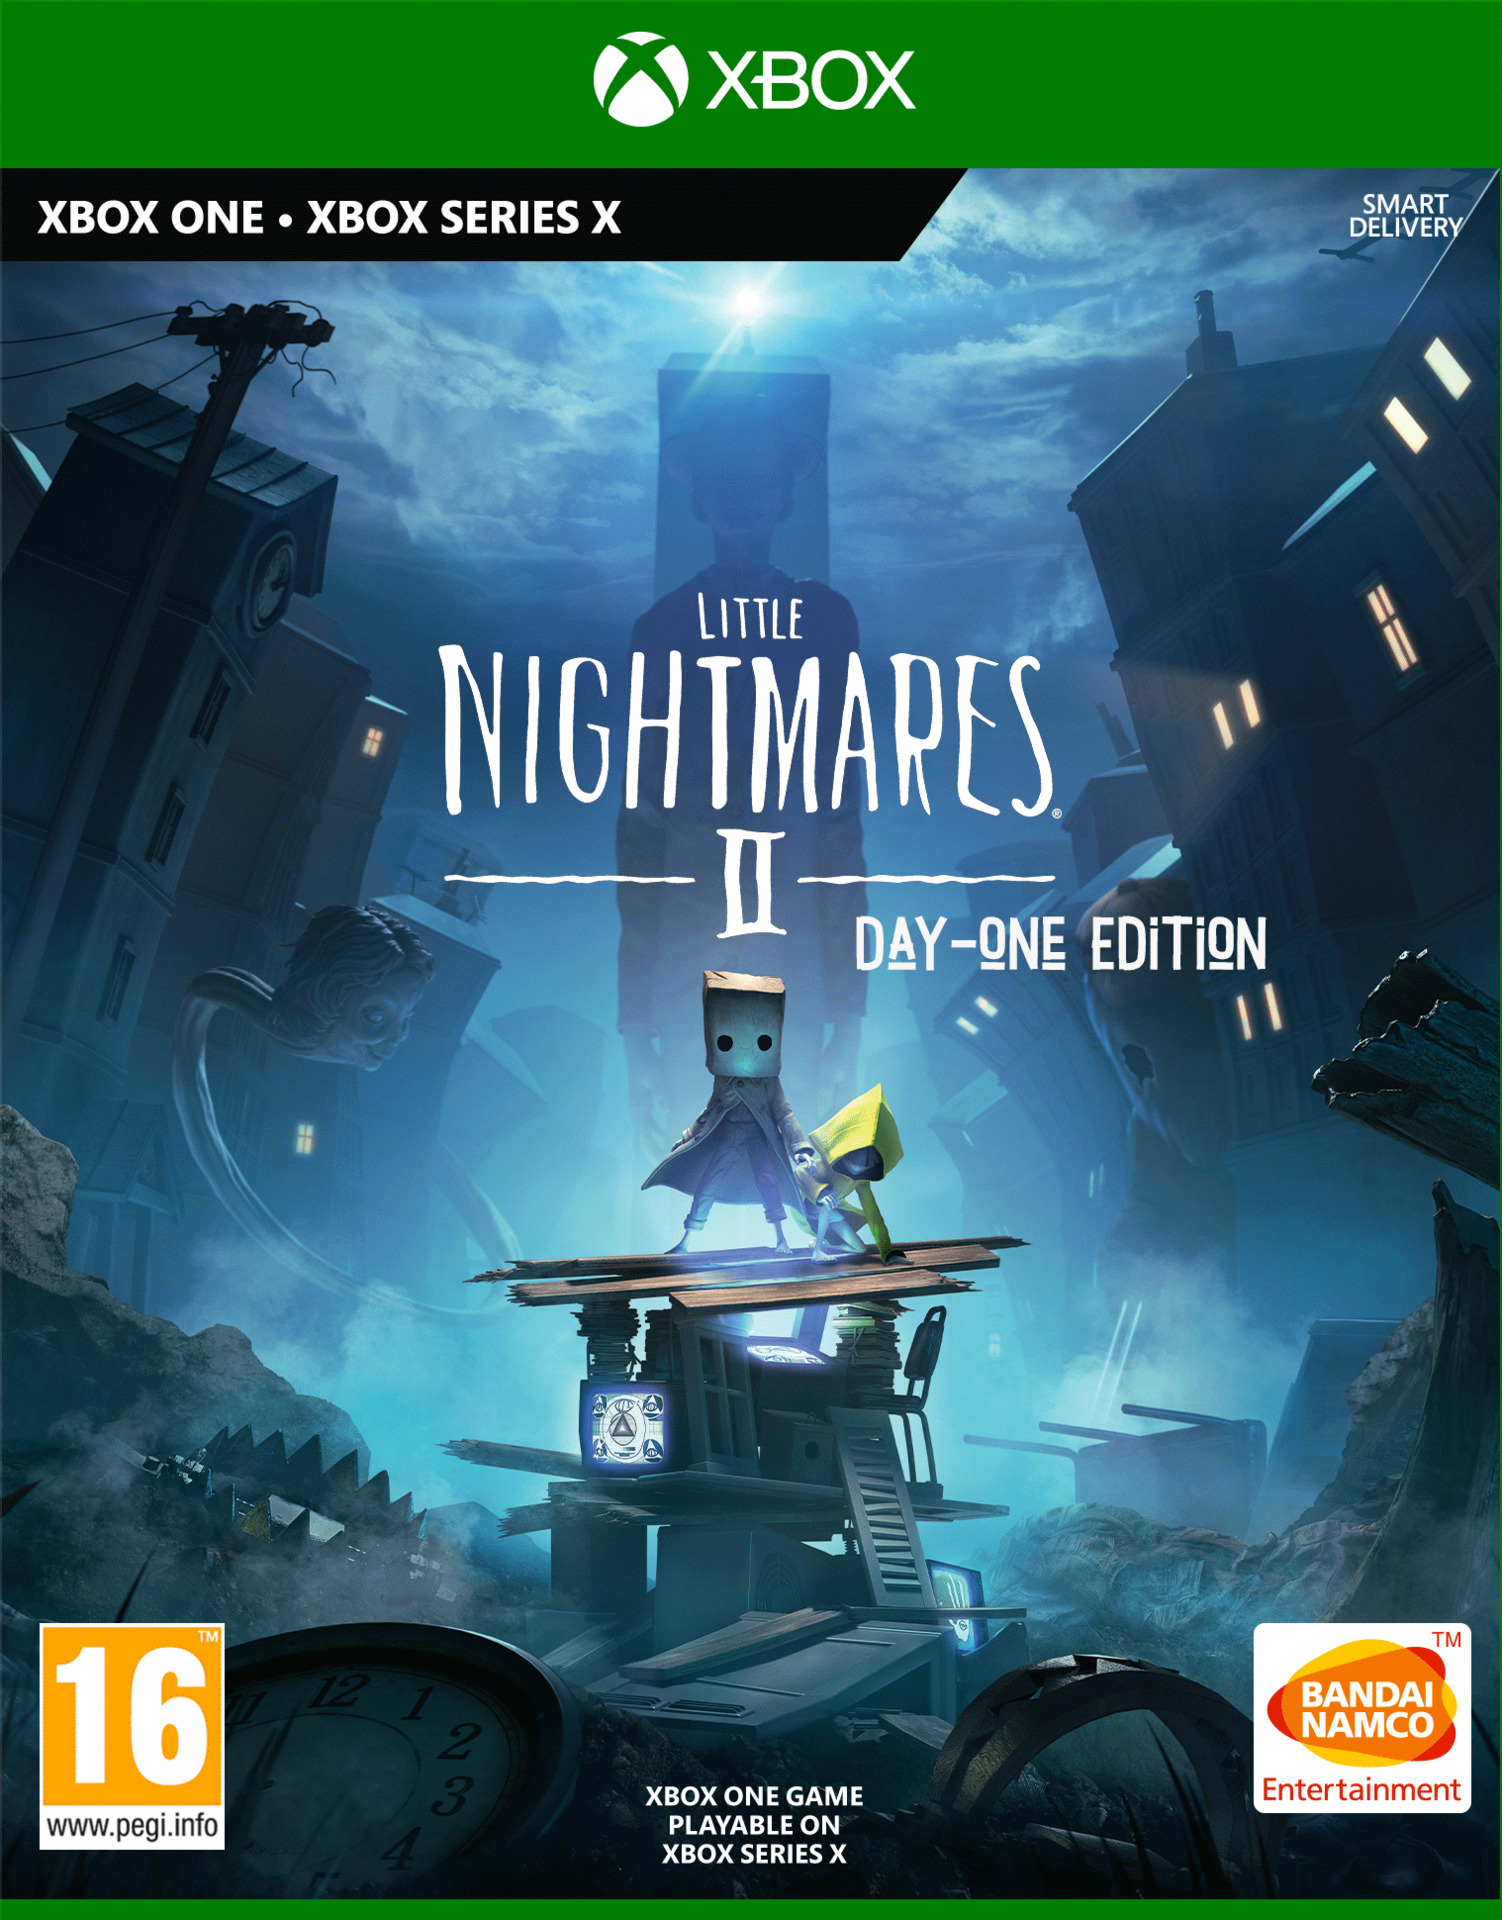 Little Nightmares II - Day One Edition (XBOX)